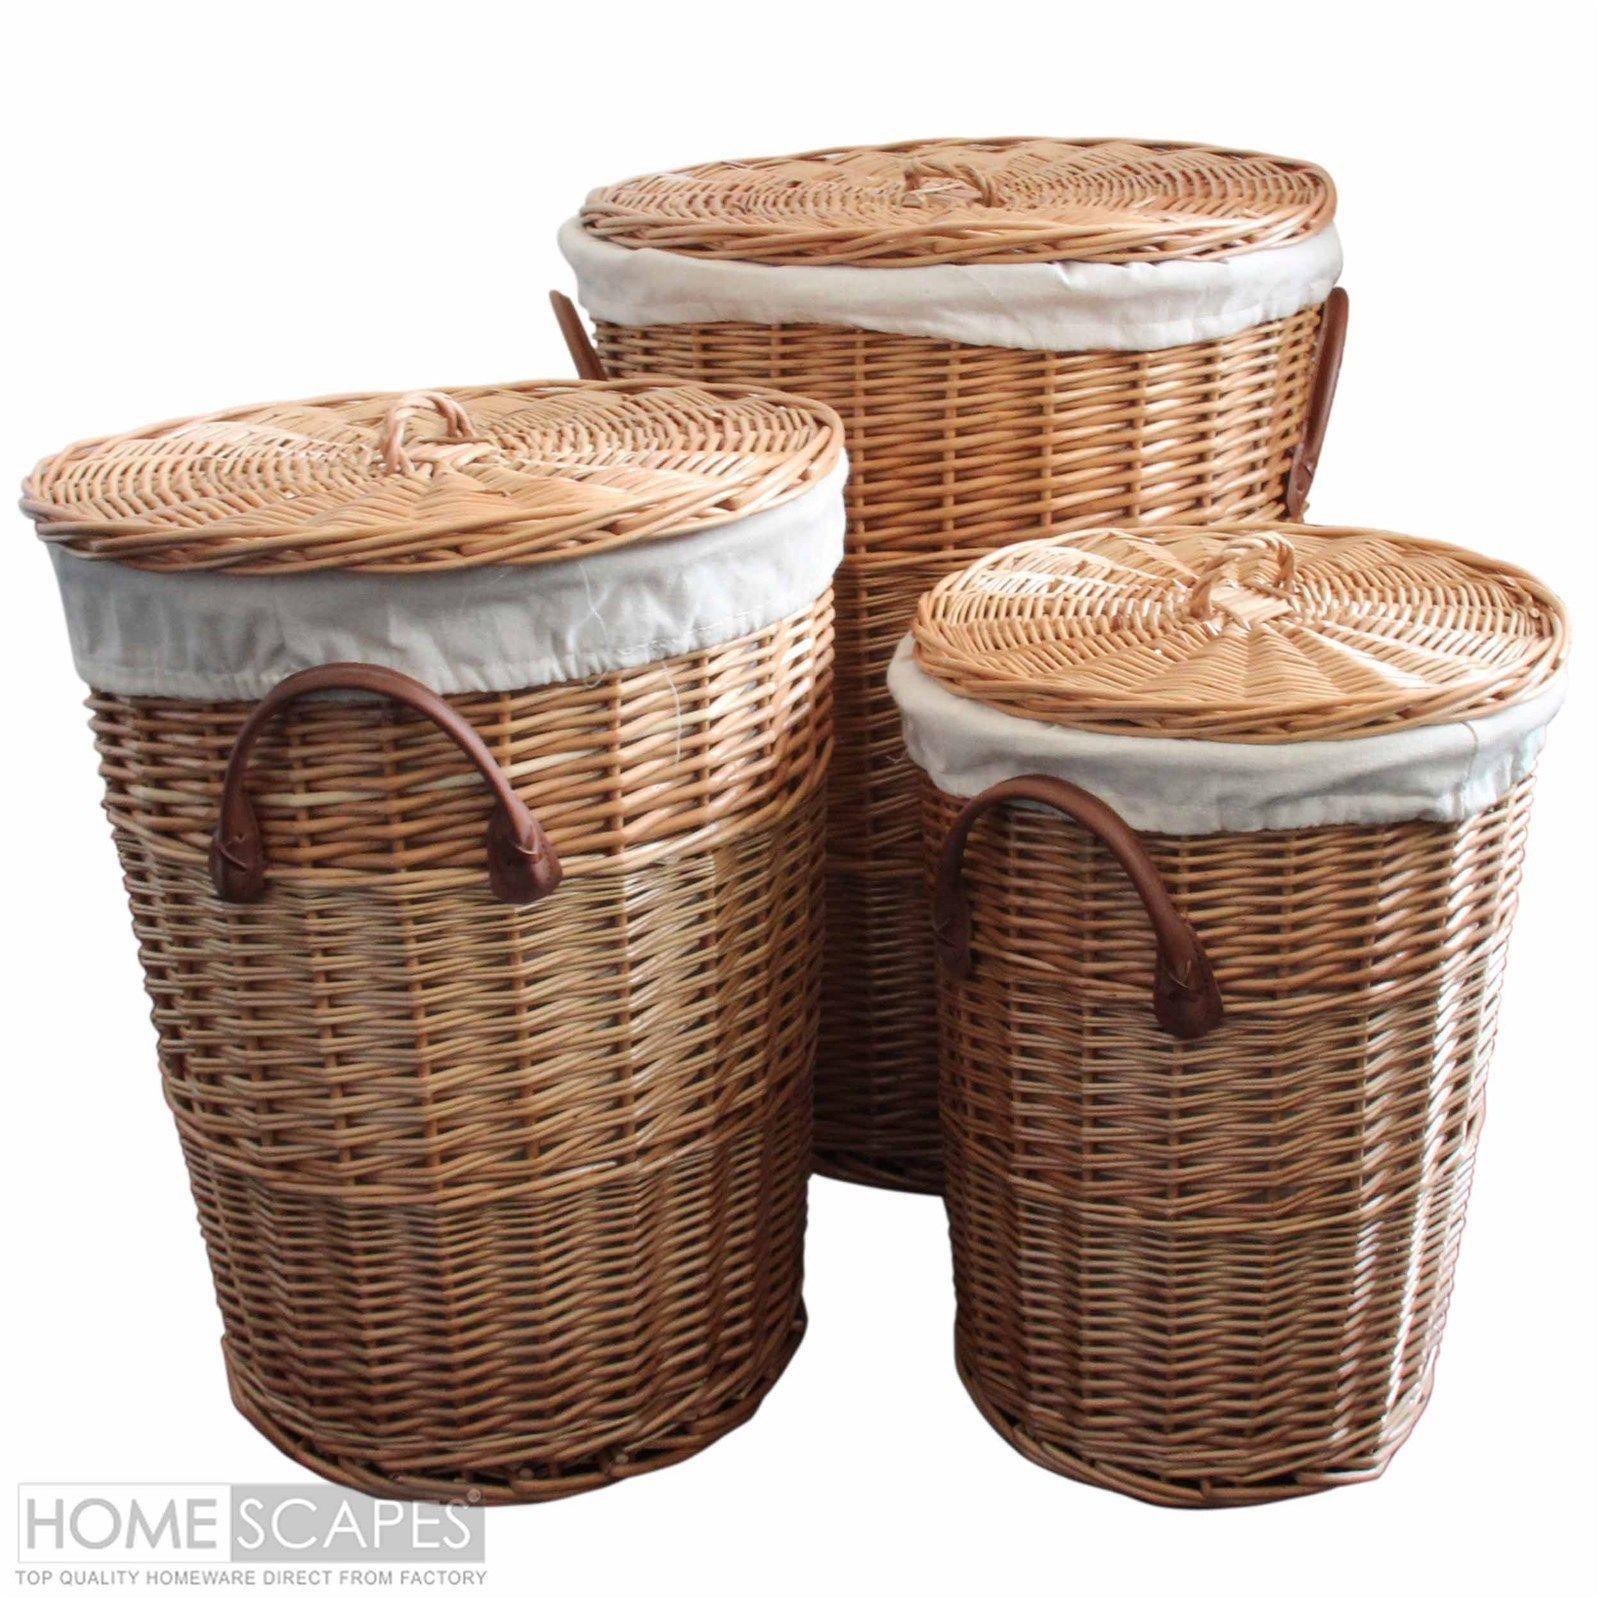 Willow Wicker Storage Basket Hamper Handles Natural Wooden: Set Of 3 Natural Round Willow Wicker Laundry Baskets